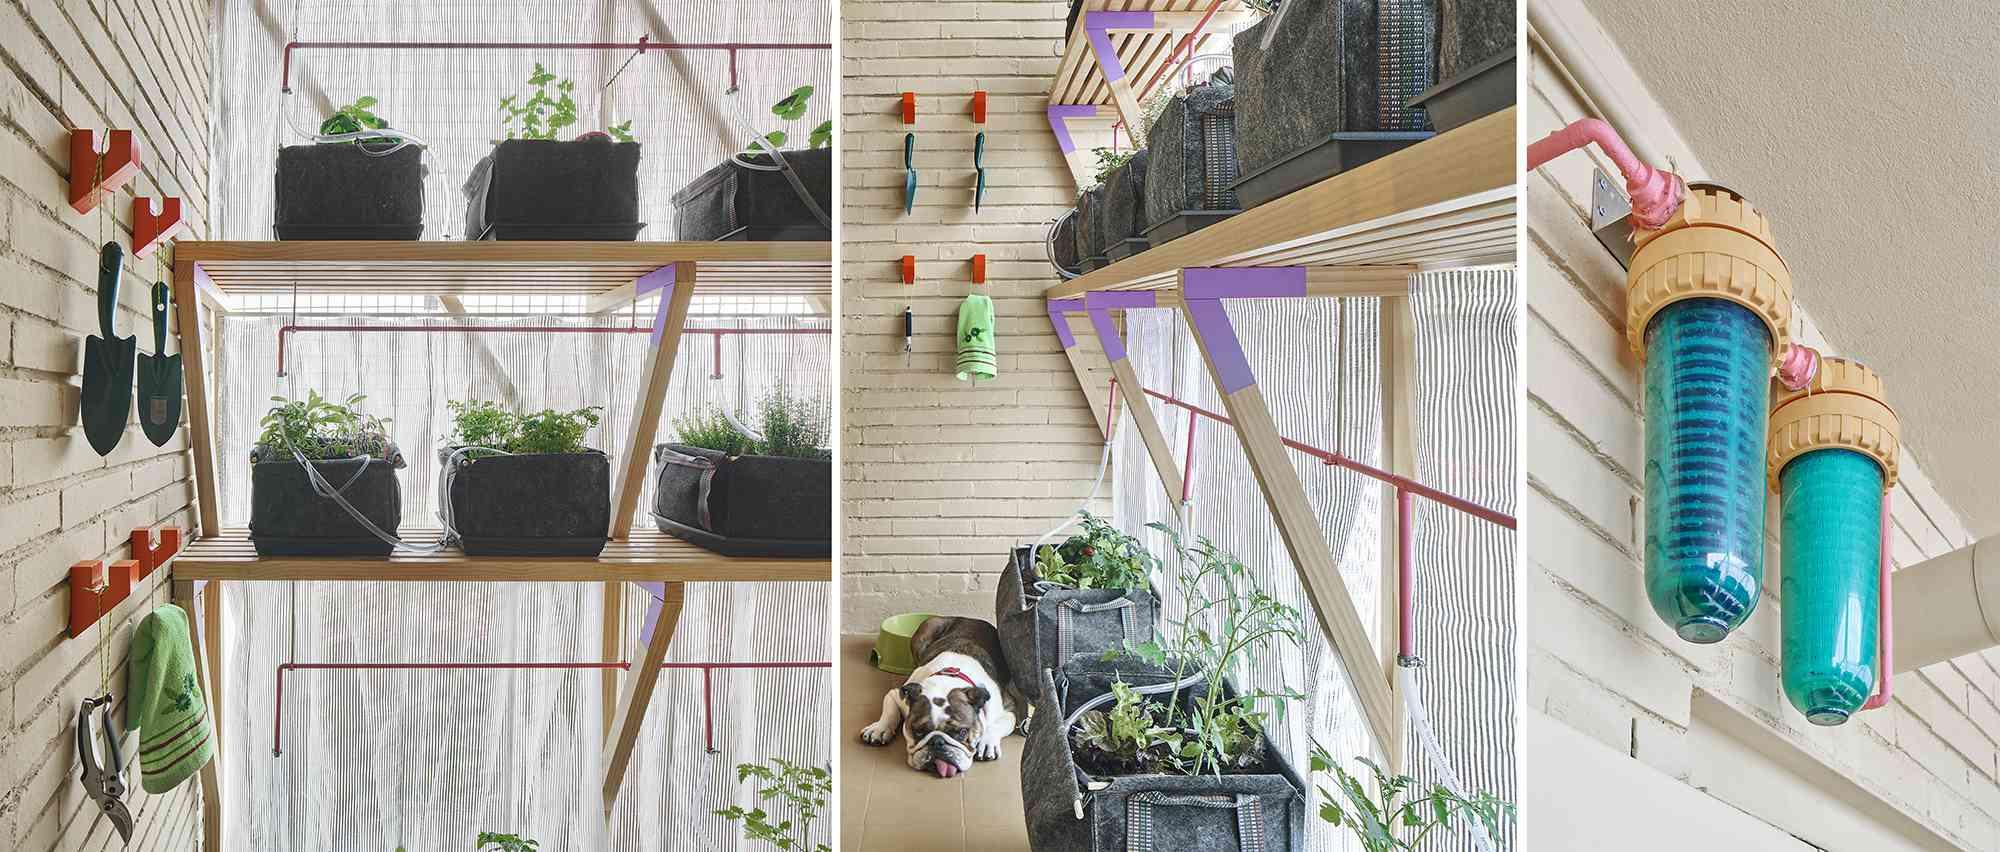 small apartment renovation madrid Husos Architects vertical garden